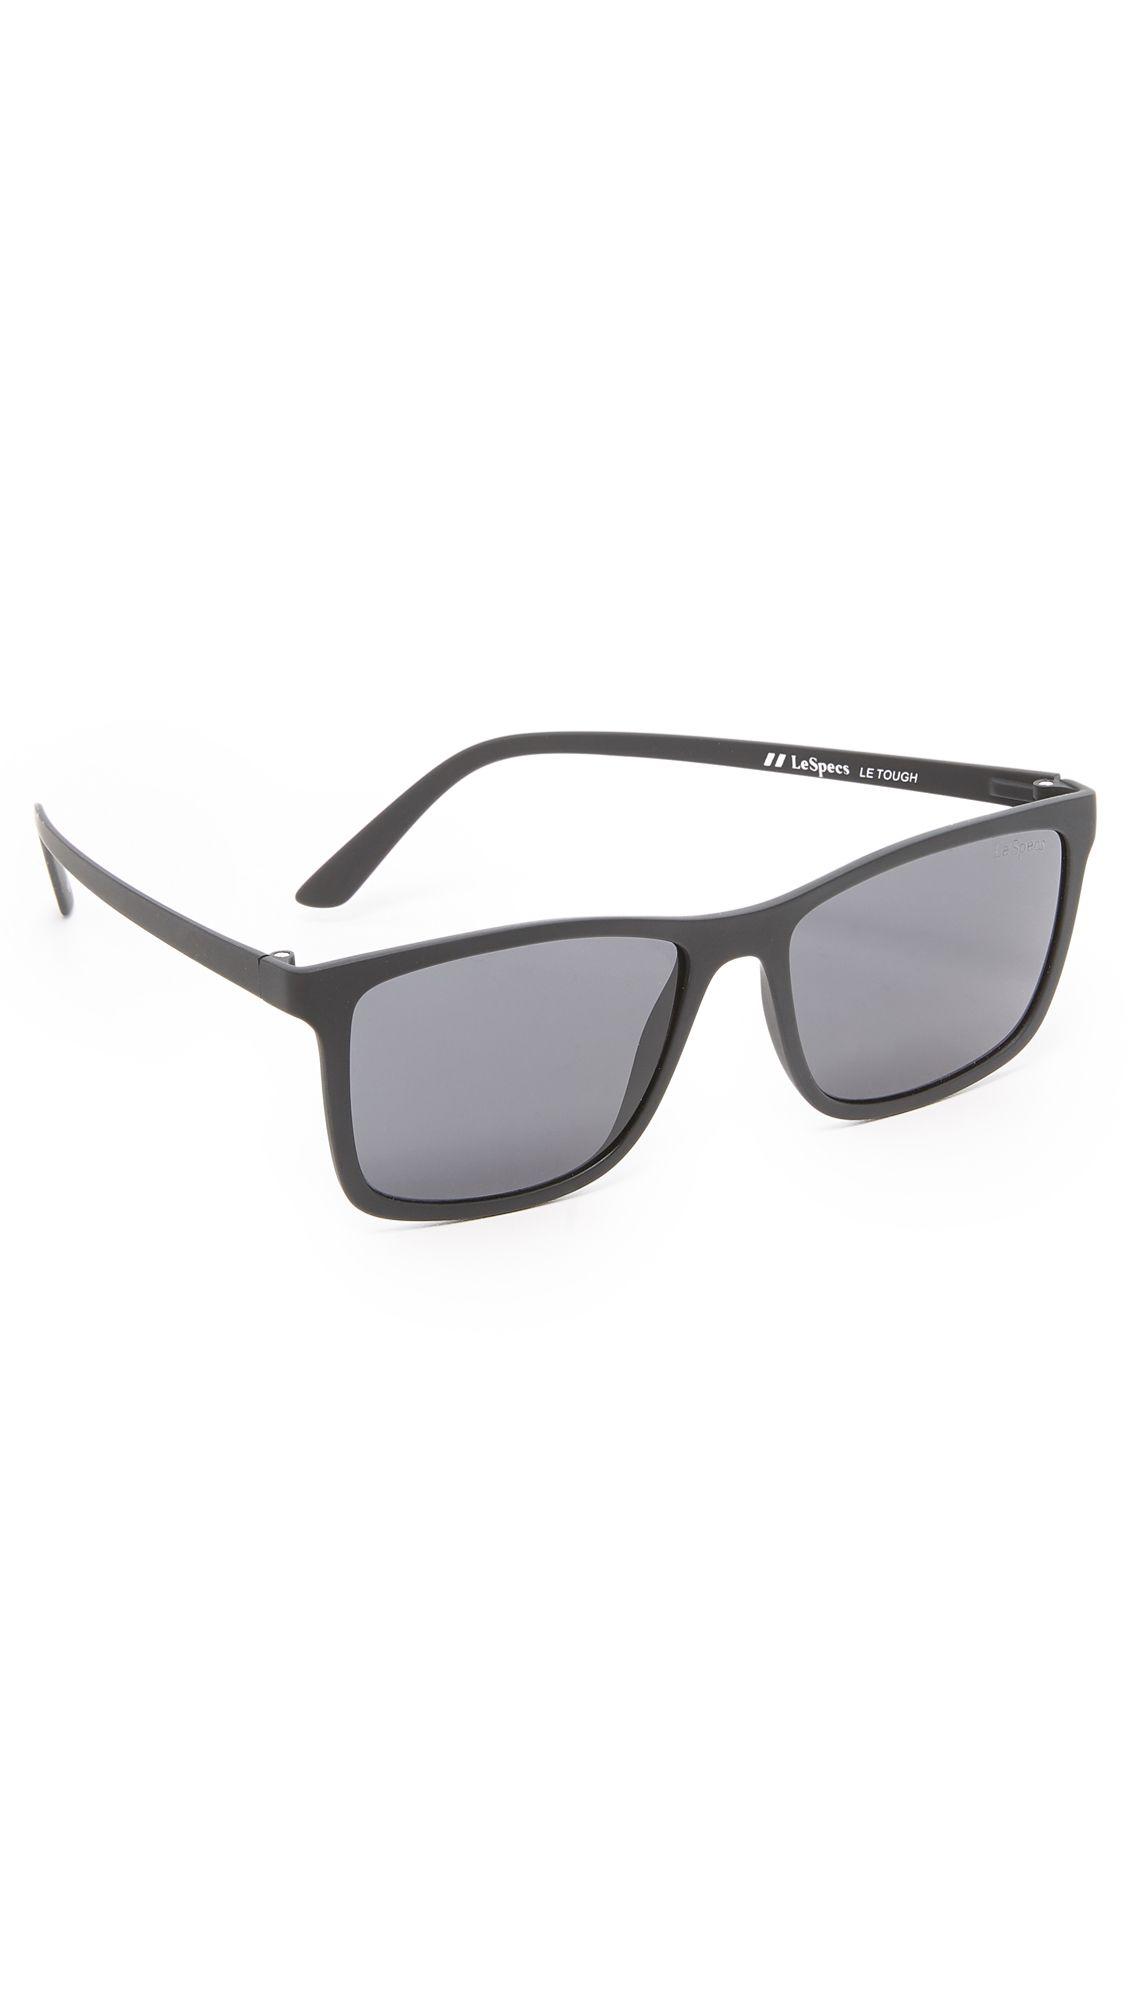 762e574c8b LE SPECS Master Tamers Sunglasses.  lespecs  sunglasses